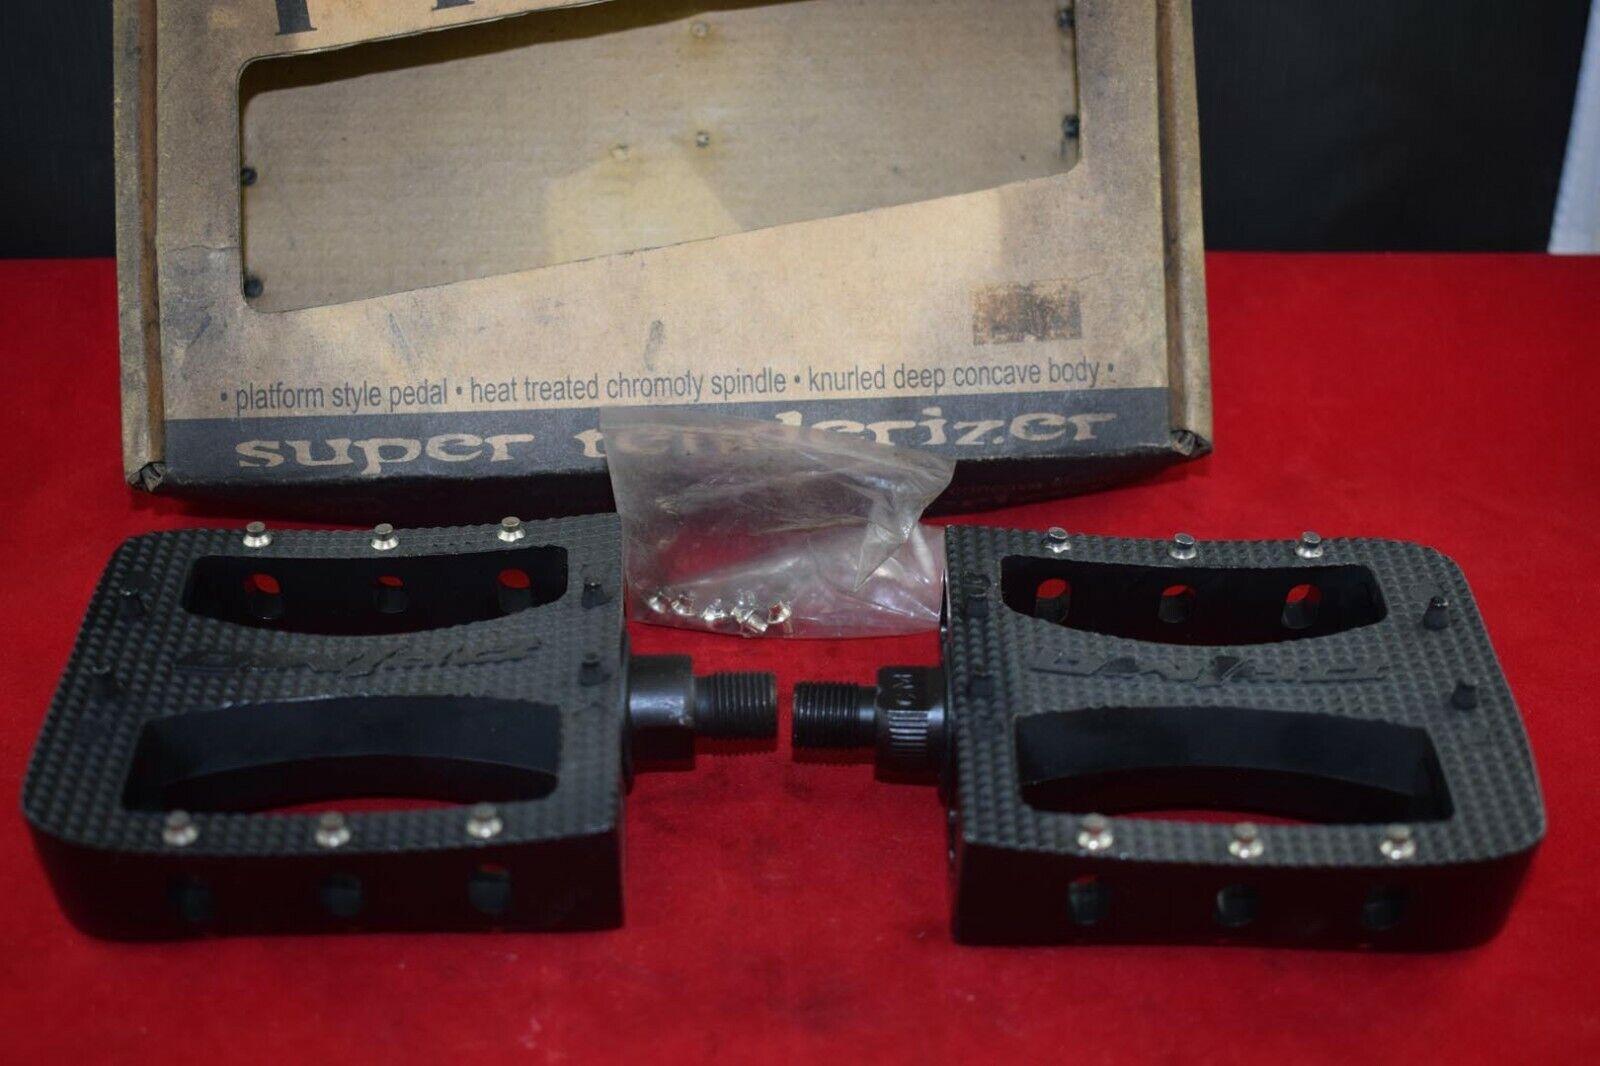 PRIMO Super Tendraiser pedaal set 1 2 Aluminium Middelbare school bmx vintage zwart NOS